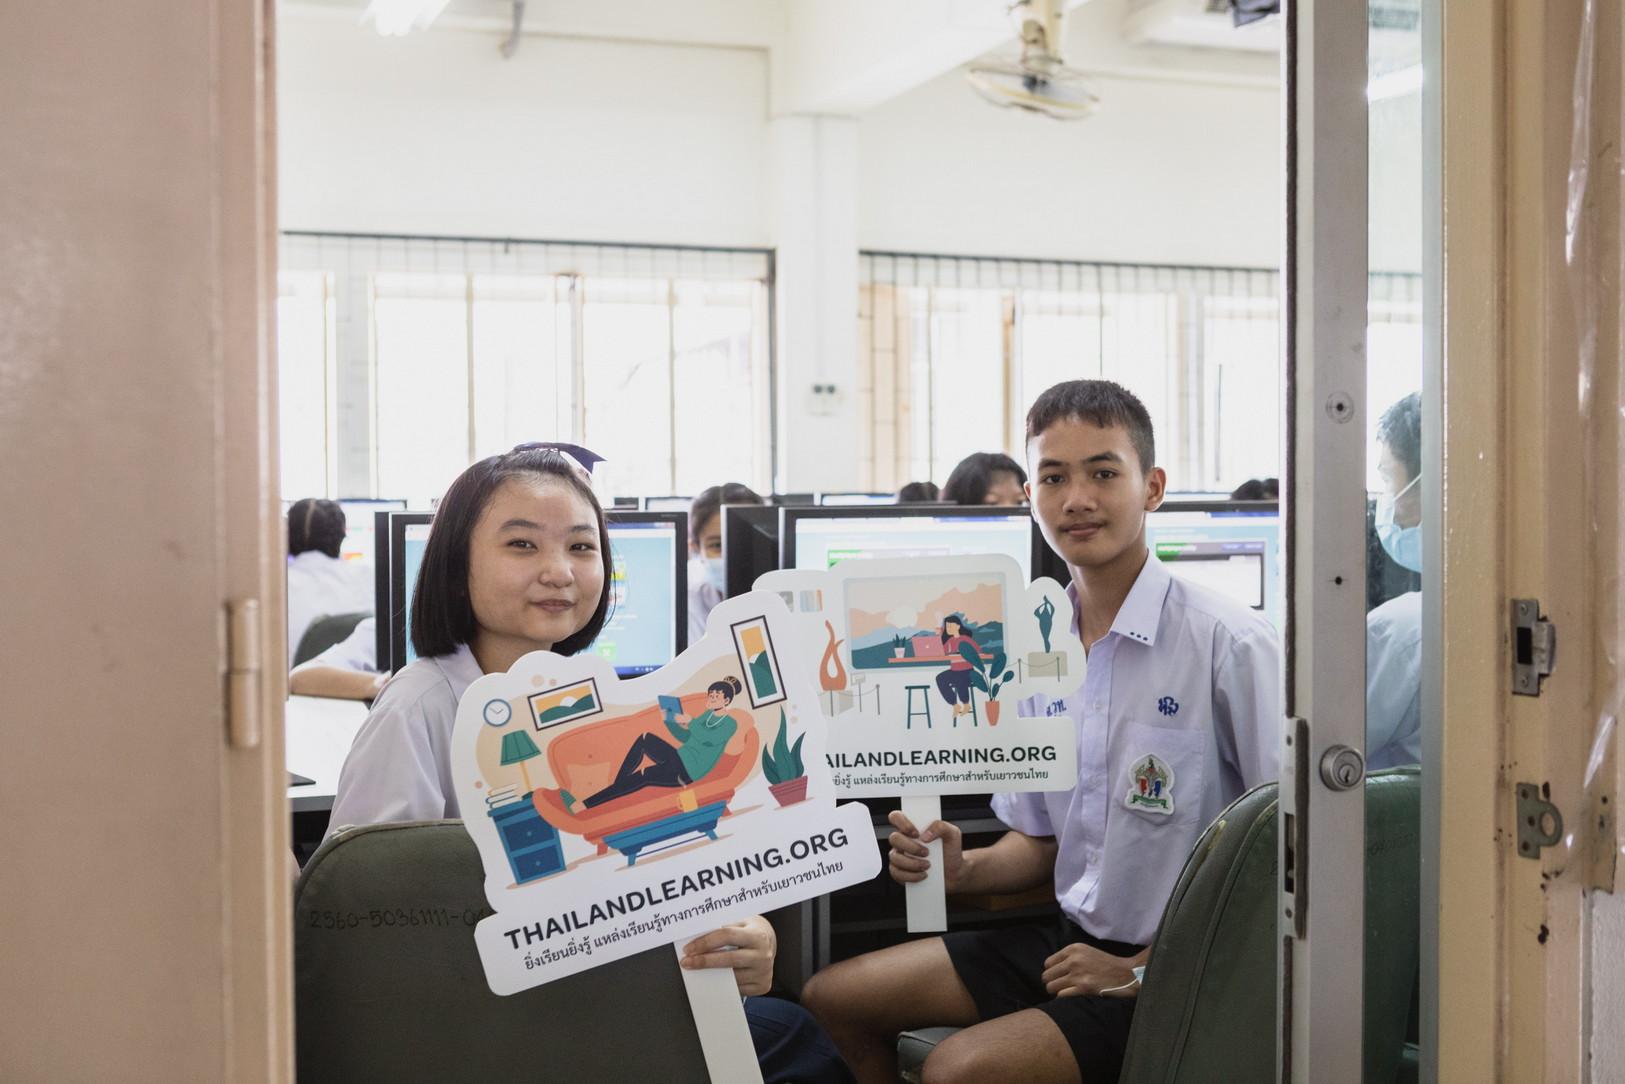 Thailand Learning รวบรวมแหล่งเรียนรู้ในโลกออนไลน์ ให้เด็กไทย